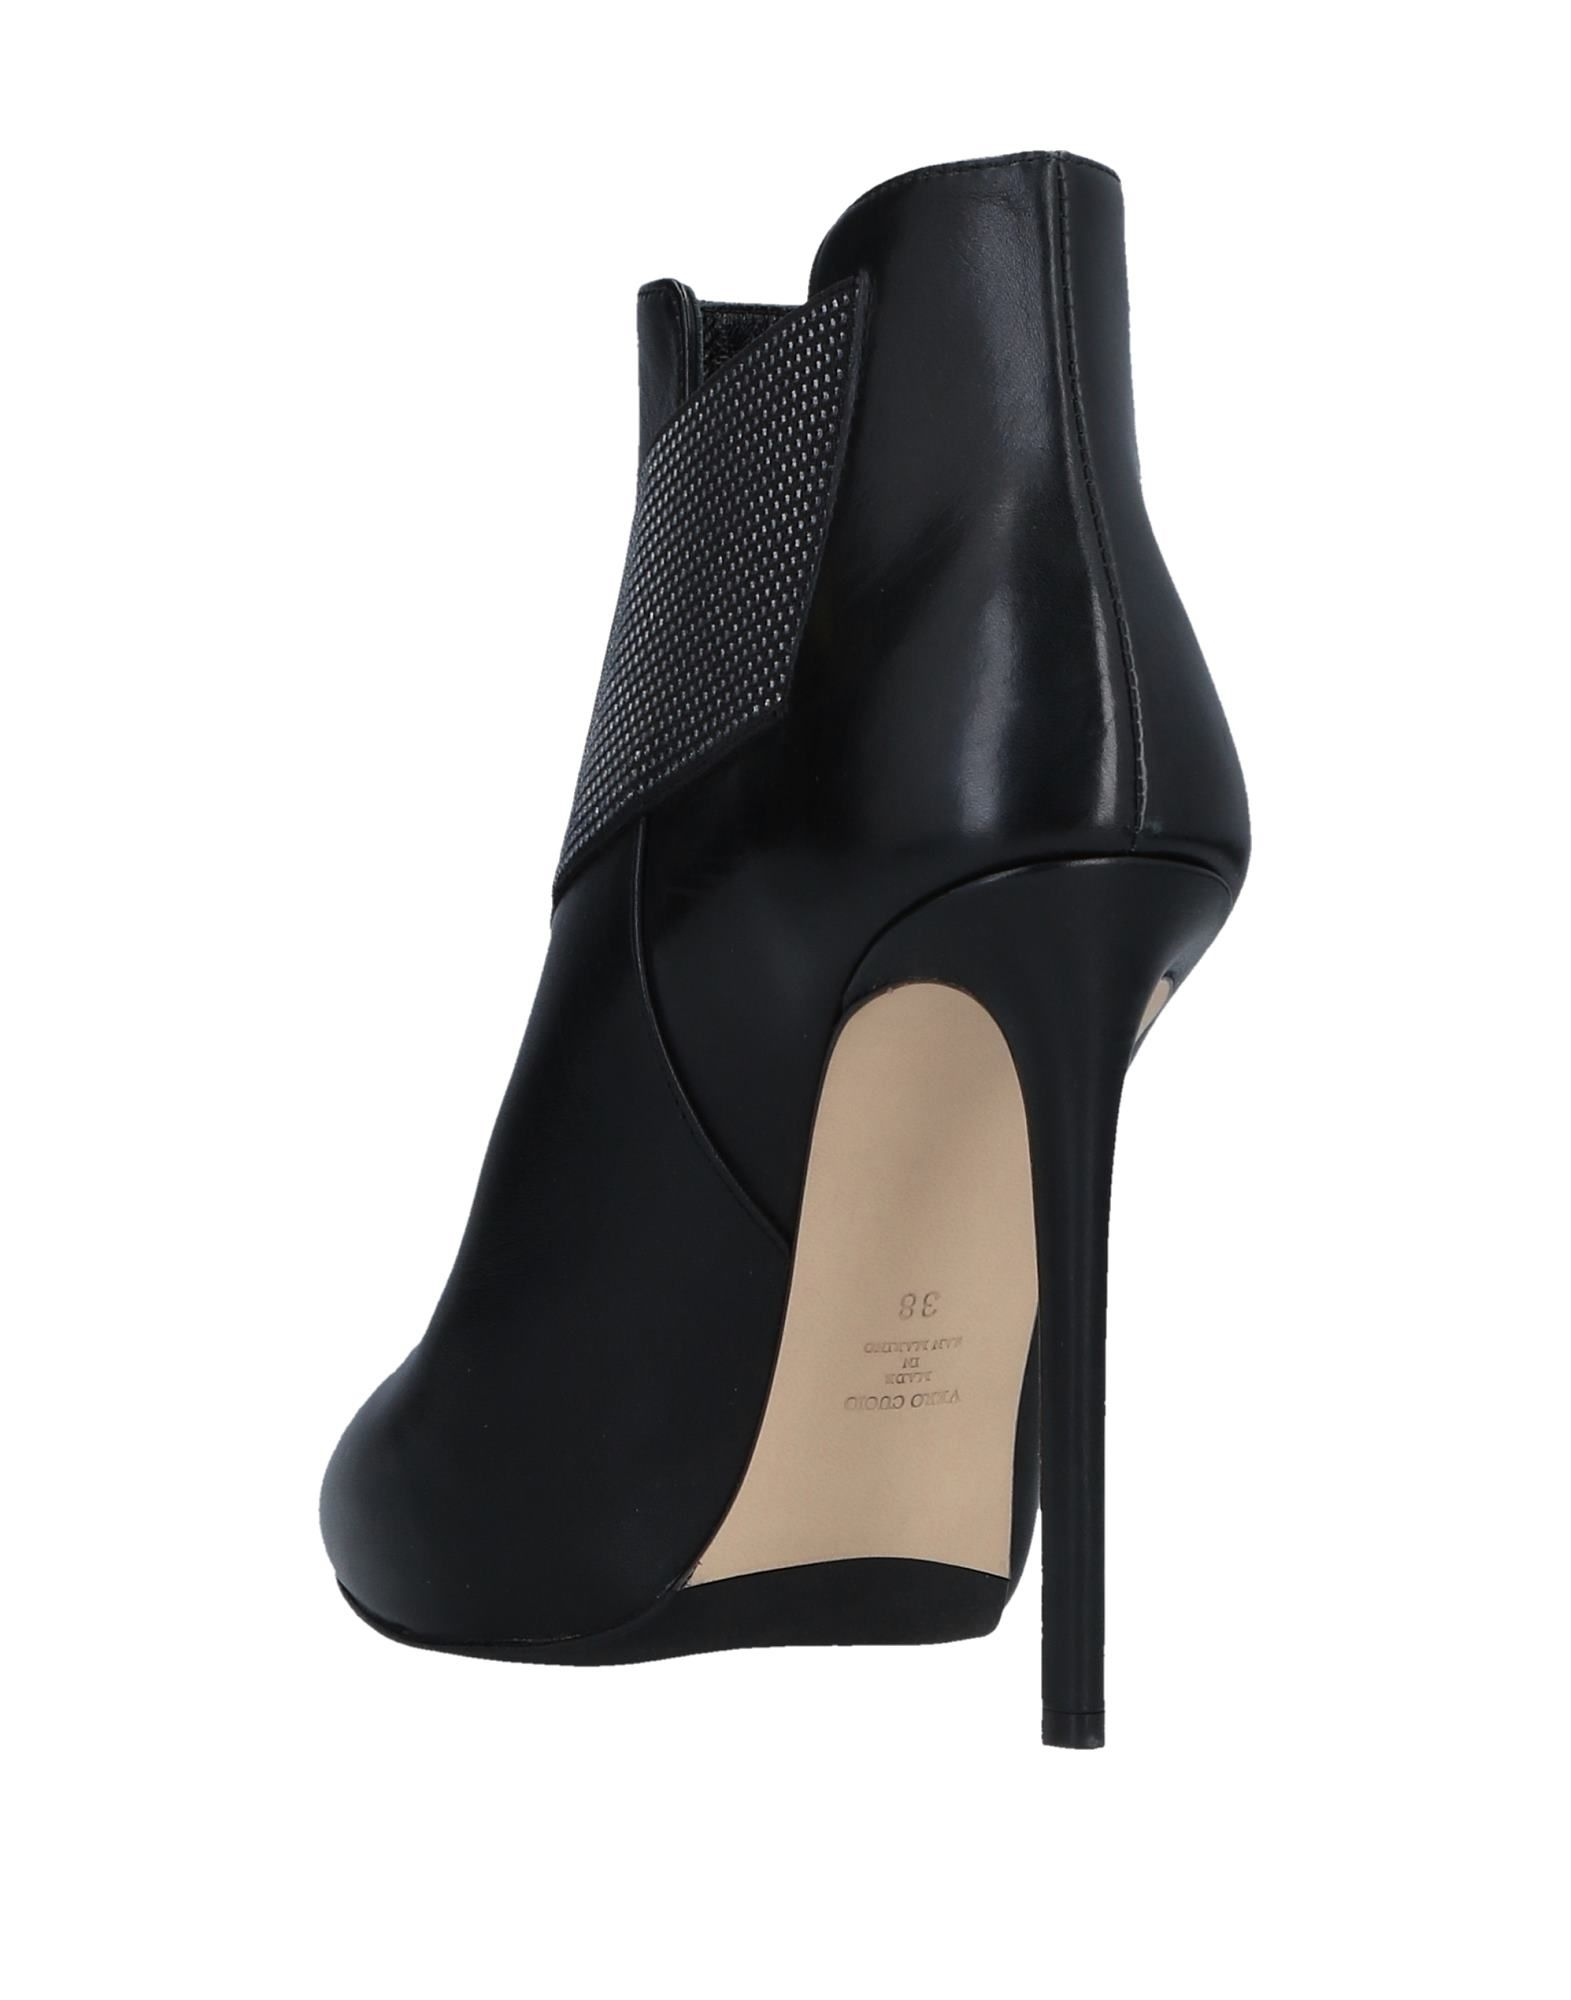 Ninalilou Stiefelette Damen Schuhe  11539543BJGut aussehende strapazierfähige Schuhe Damen cc9daf